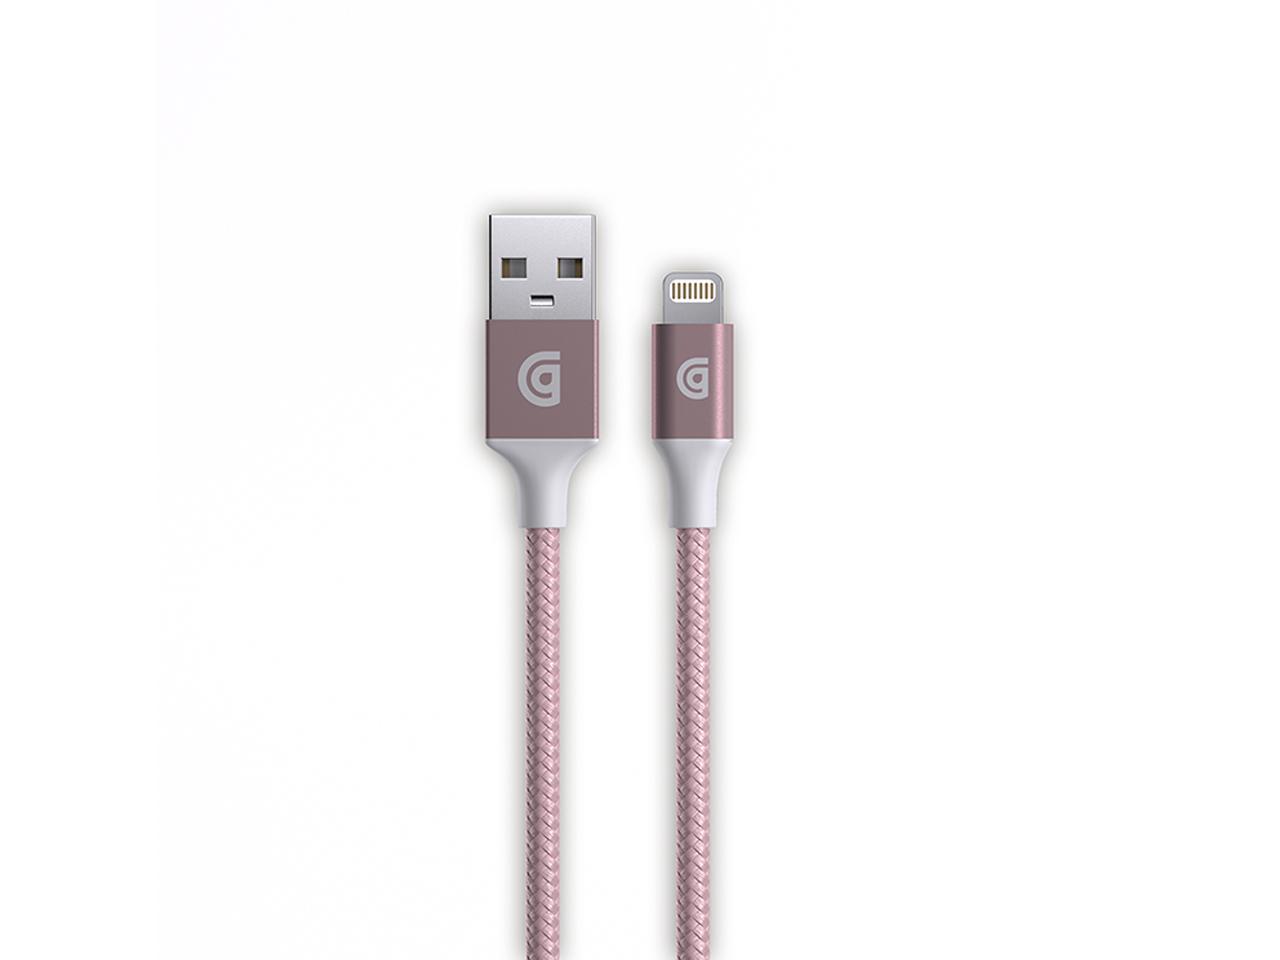 Premium Braided Lightning Cable